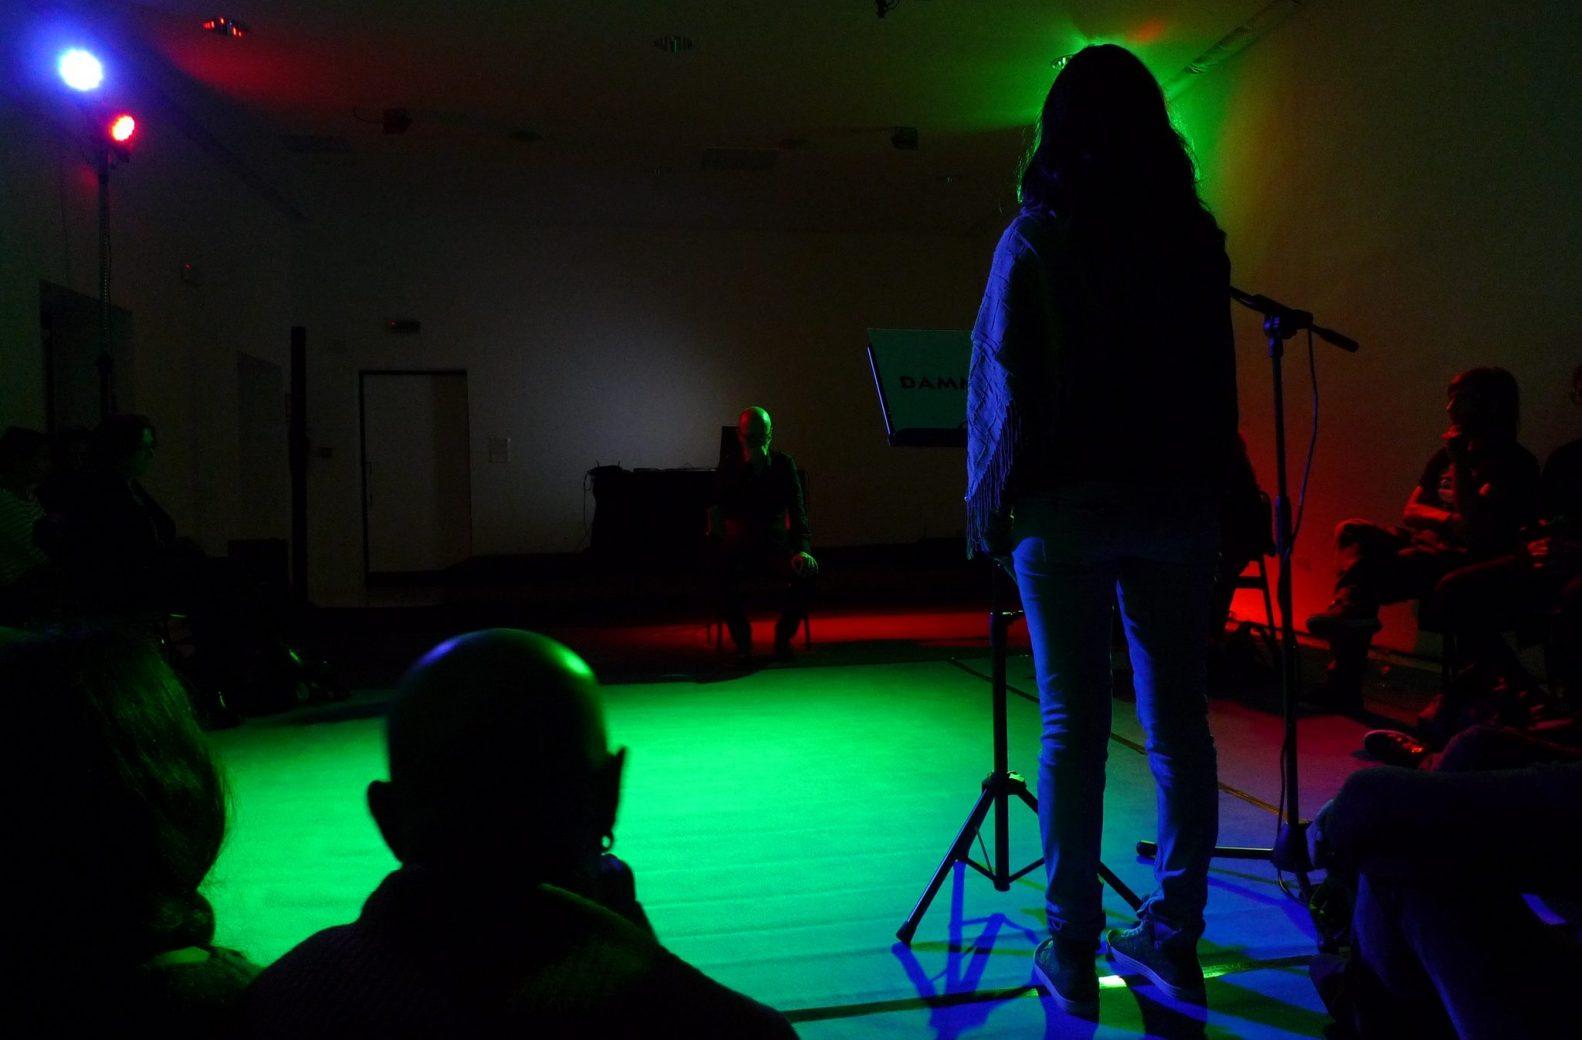 performance-dar-la-voz-negada-1